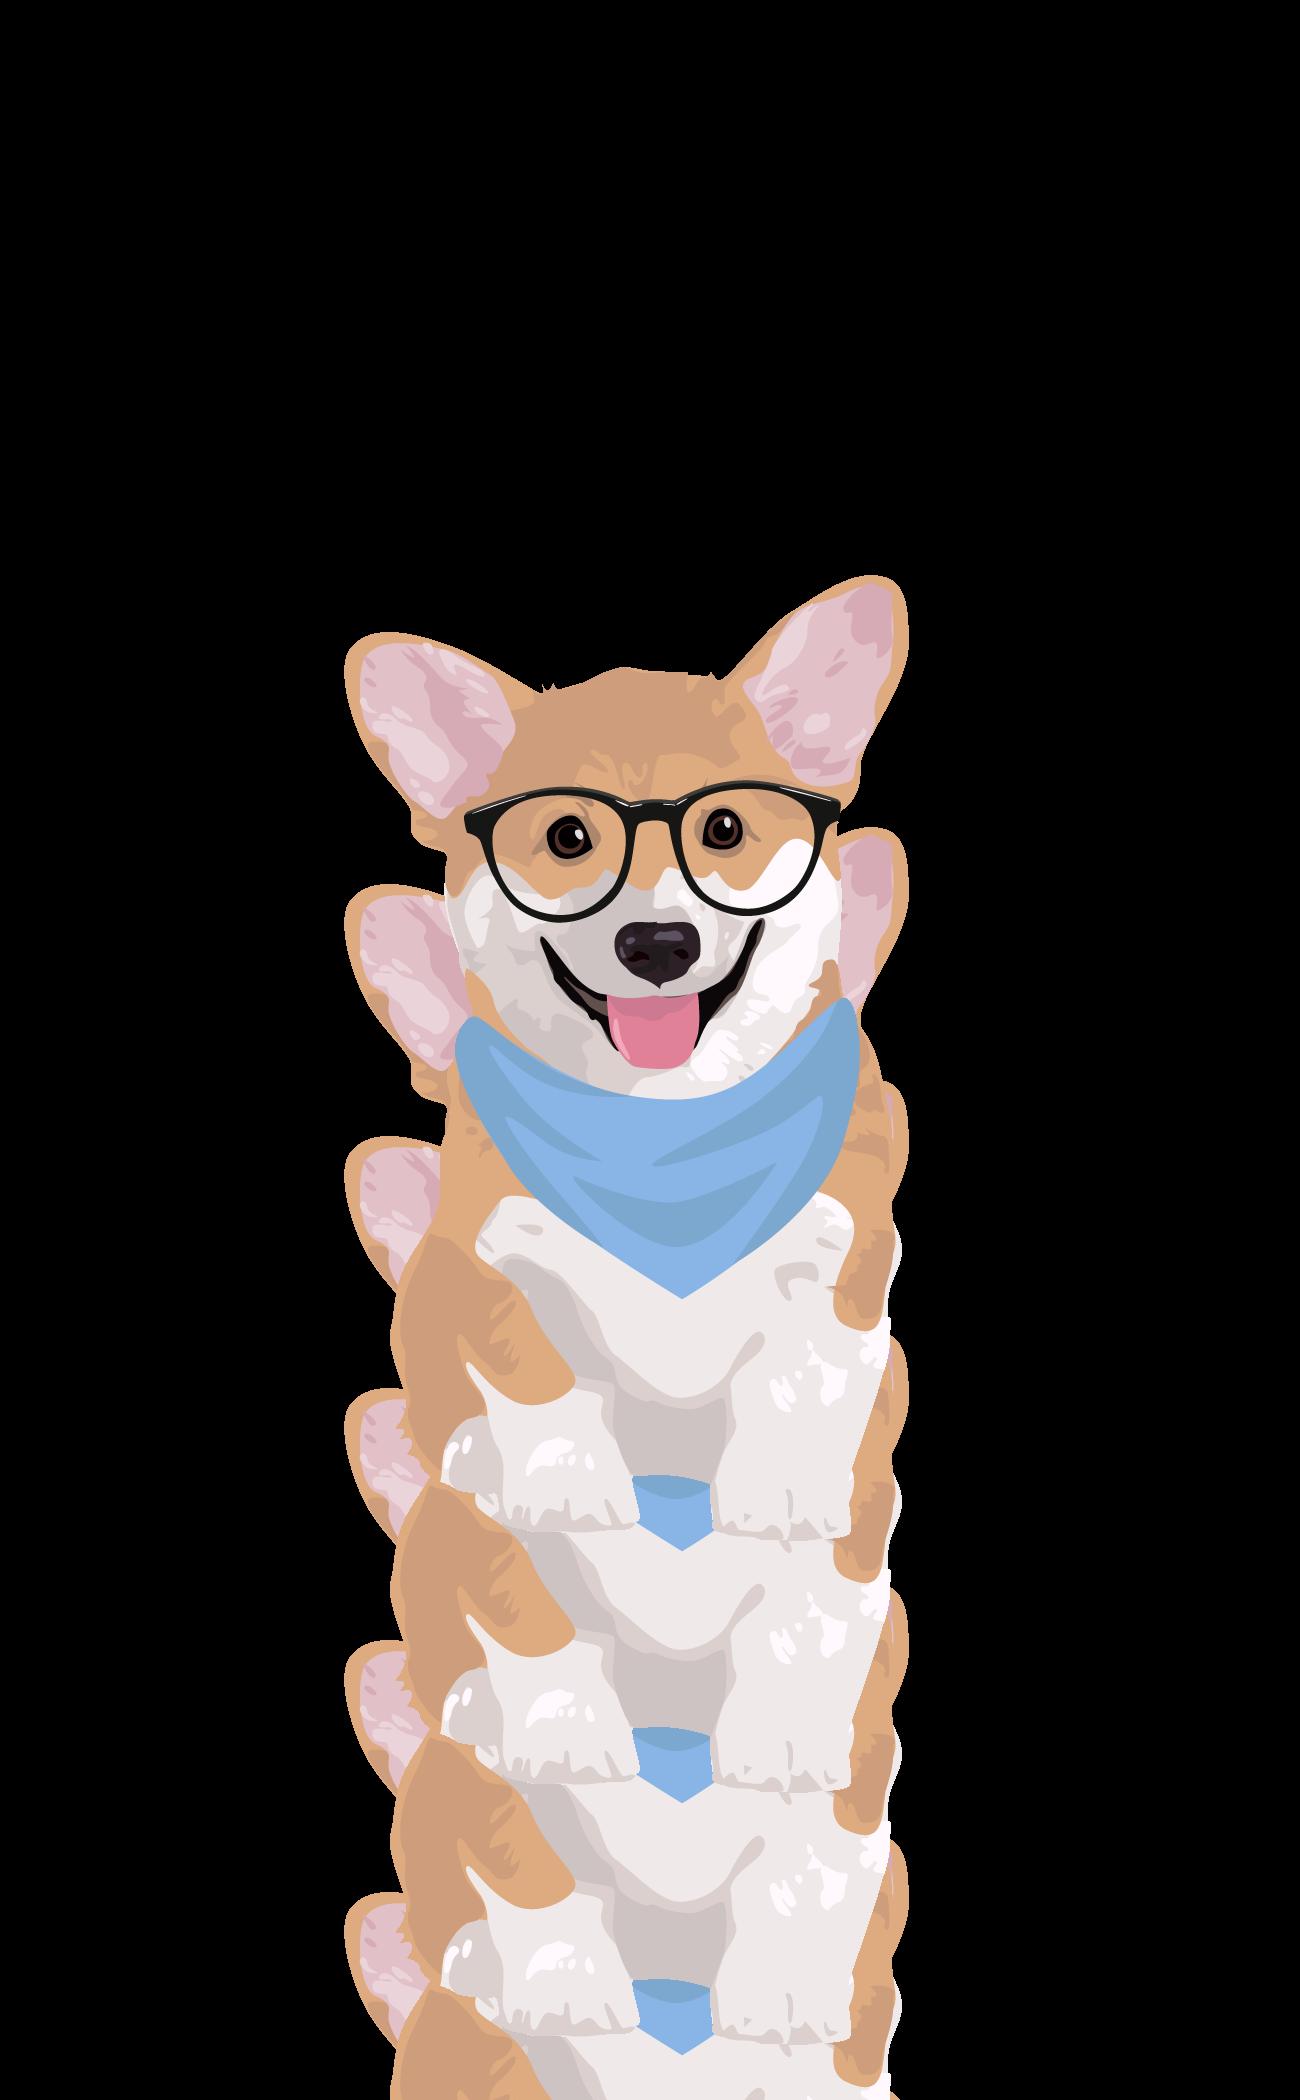 Hipster Corgi Casetify Iphone Art Design Illustration Dogs Animals Cute Cool Wallpaper Dog Wallpaper Iphone Corgi Art Cute Cartoon Wallpapers